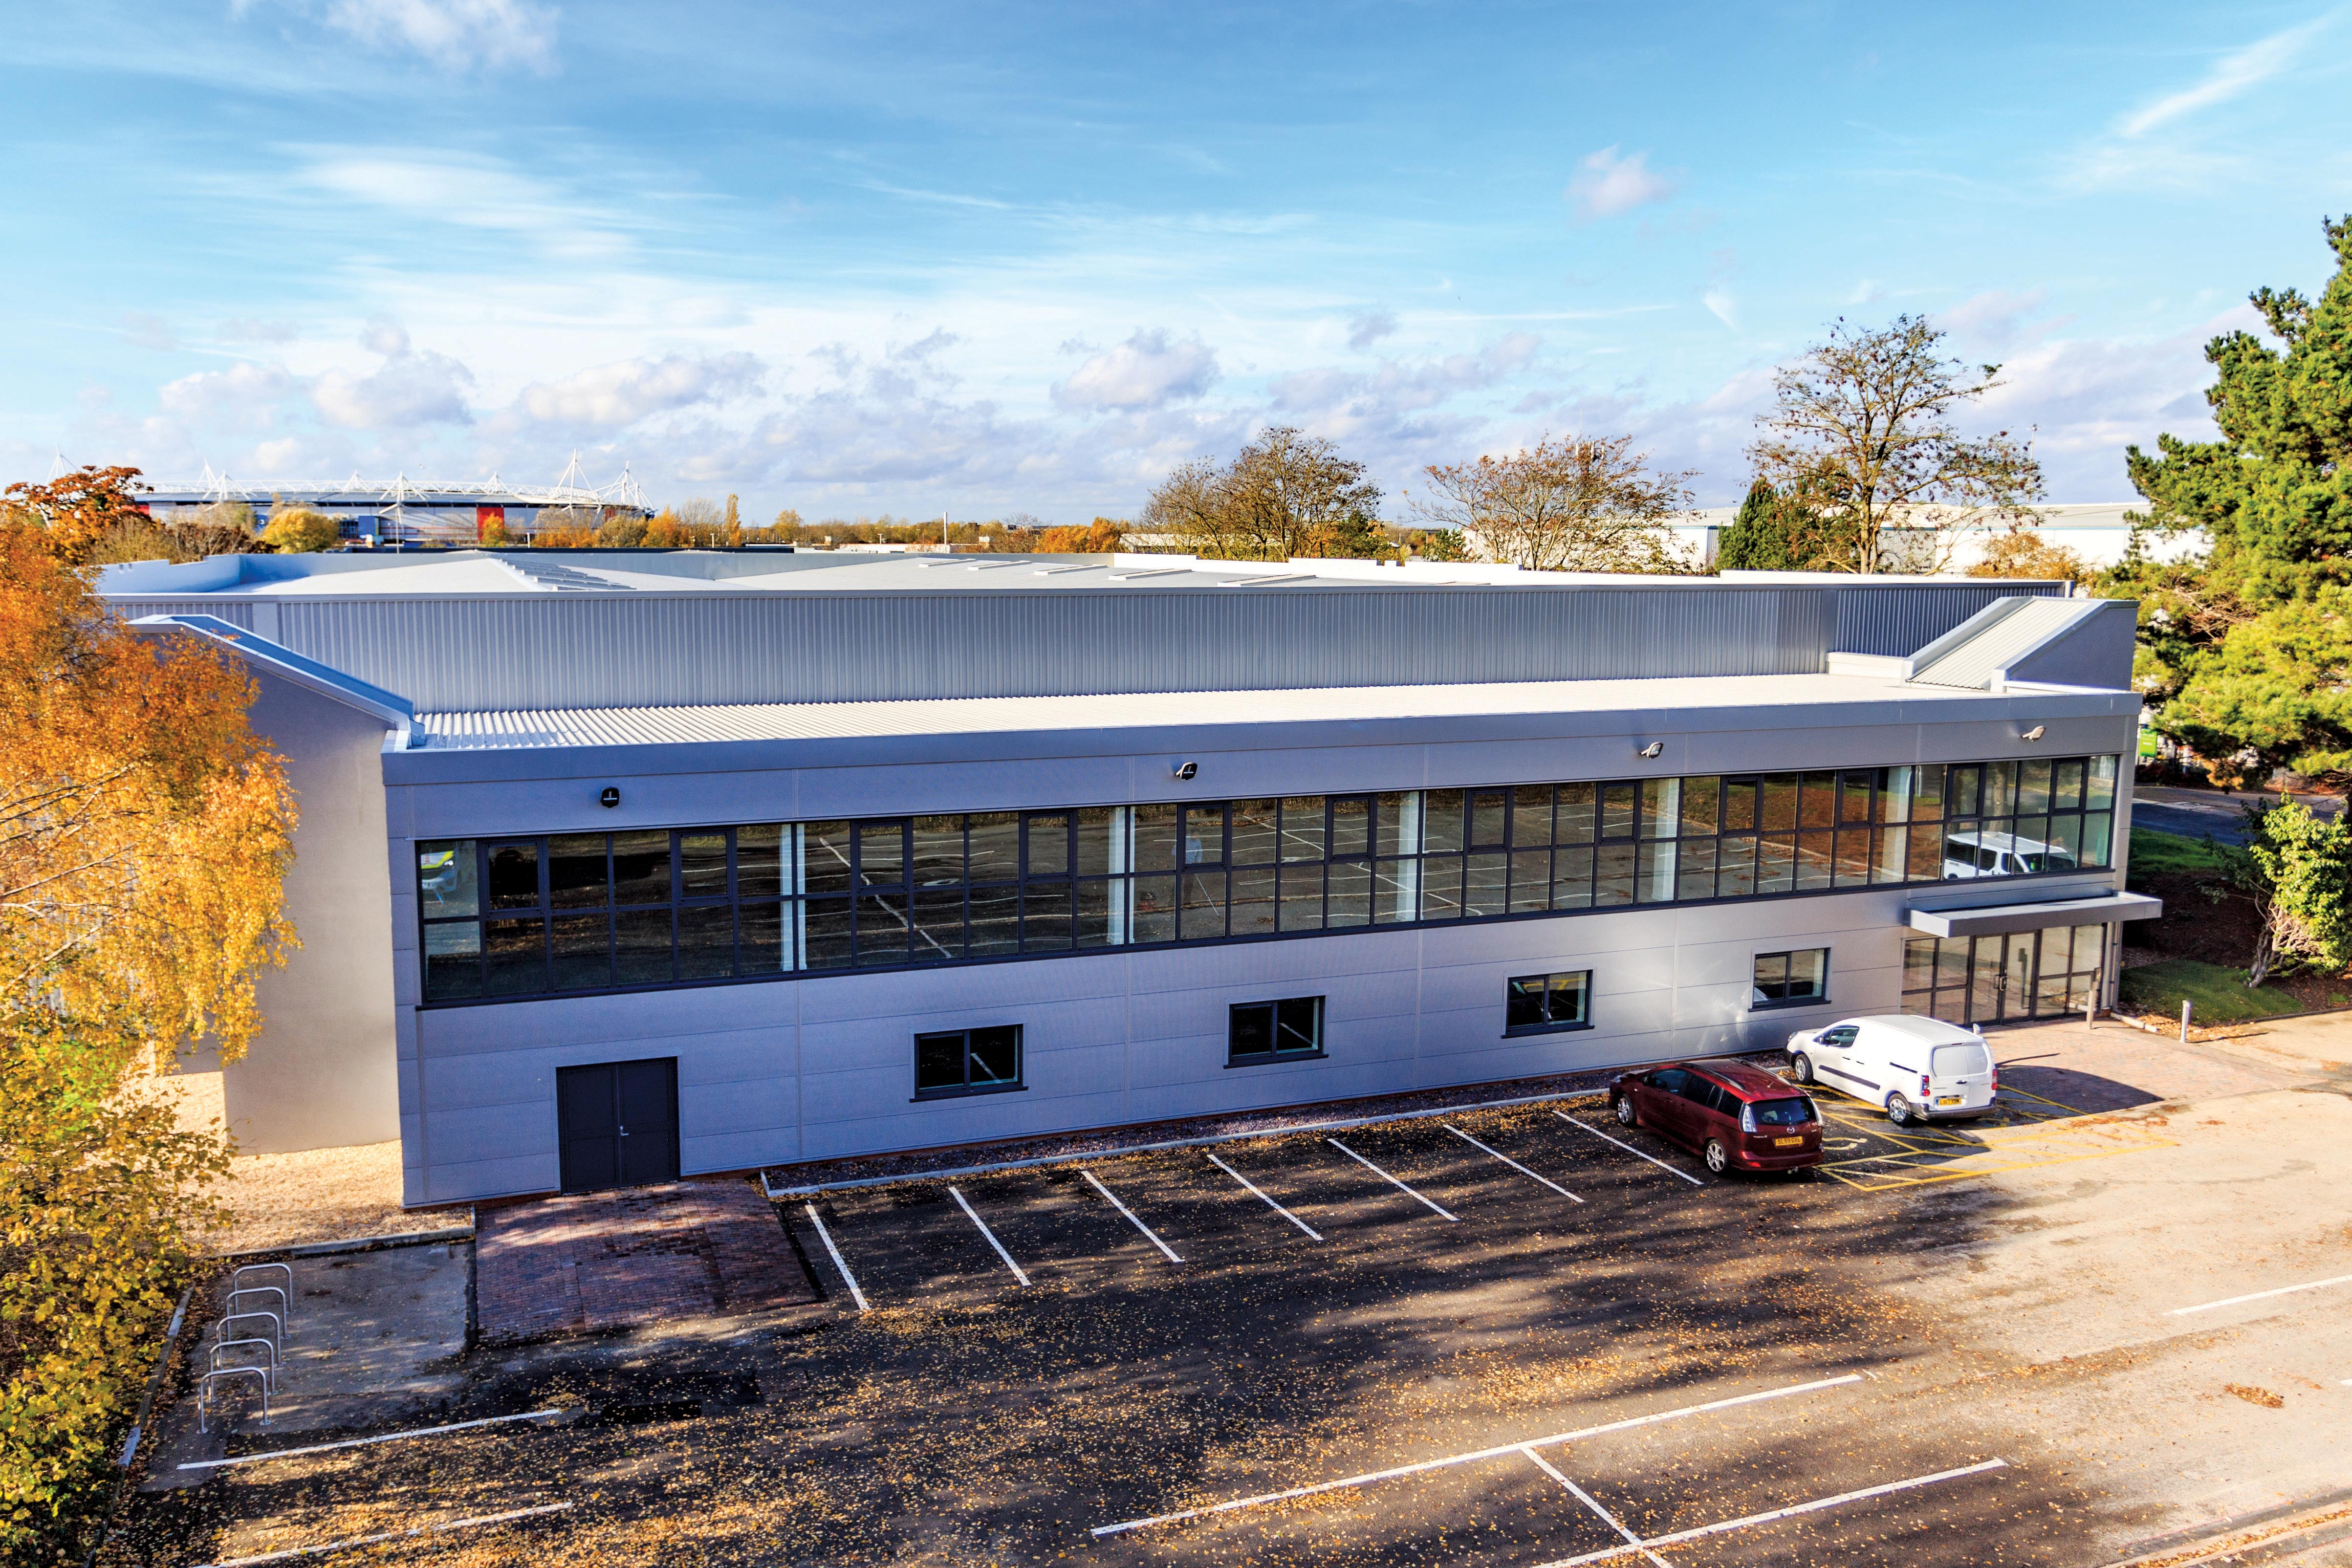 Ceramex Opens £3m Facility in Reading